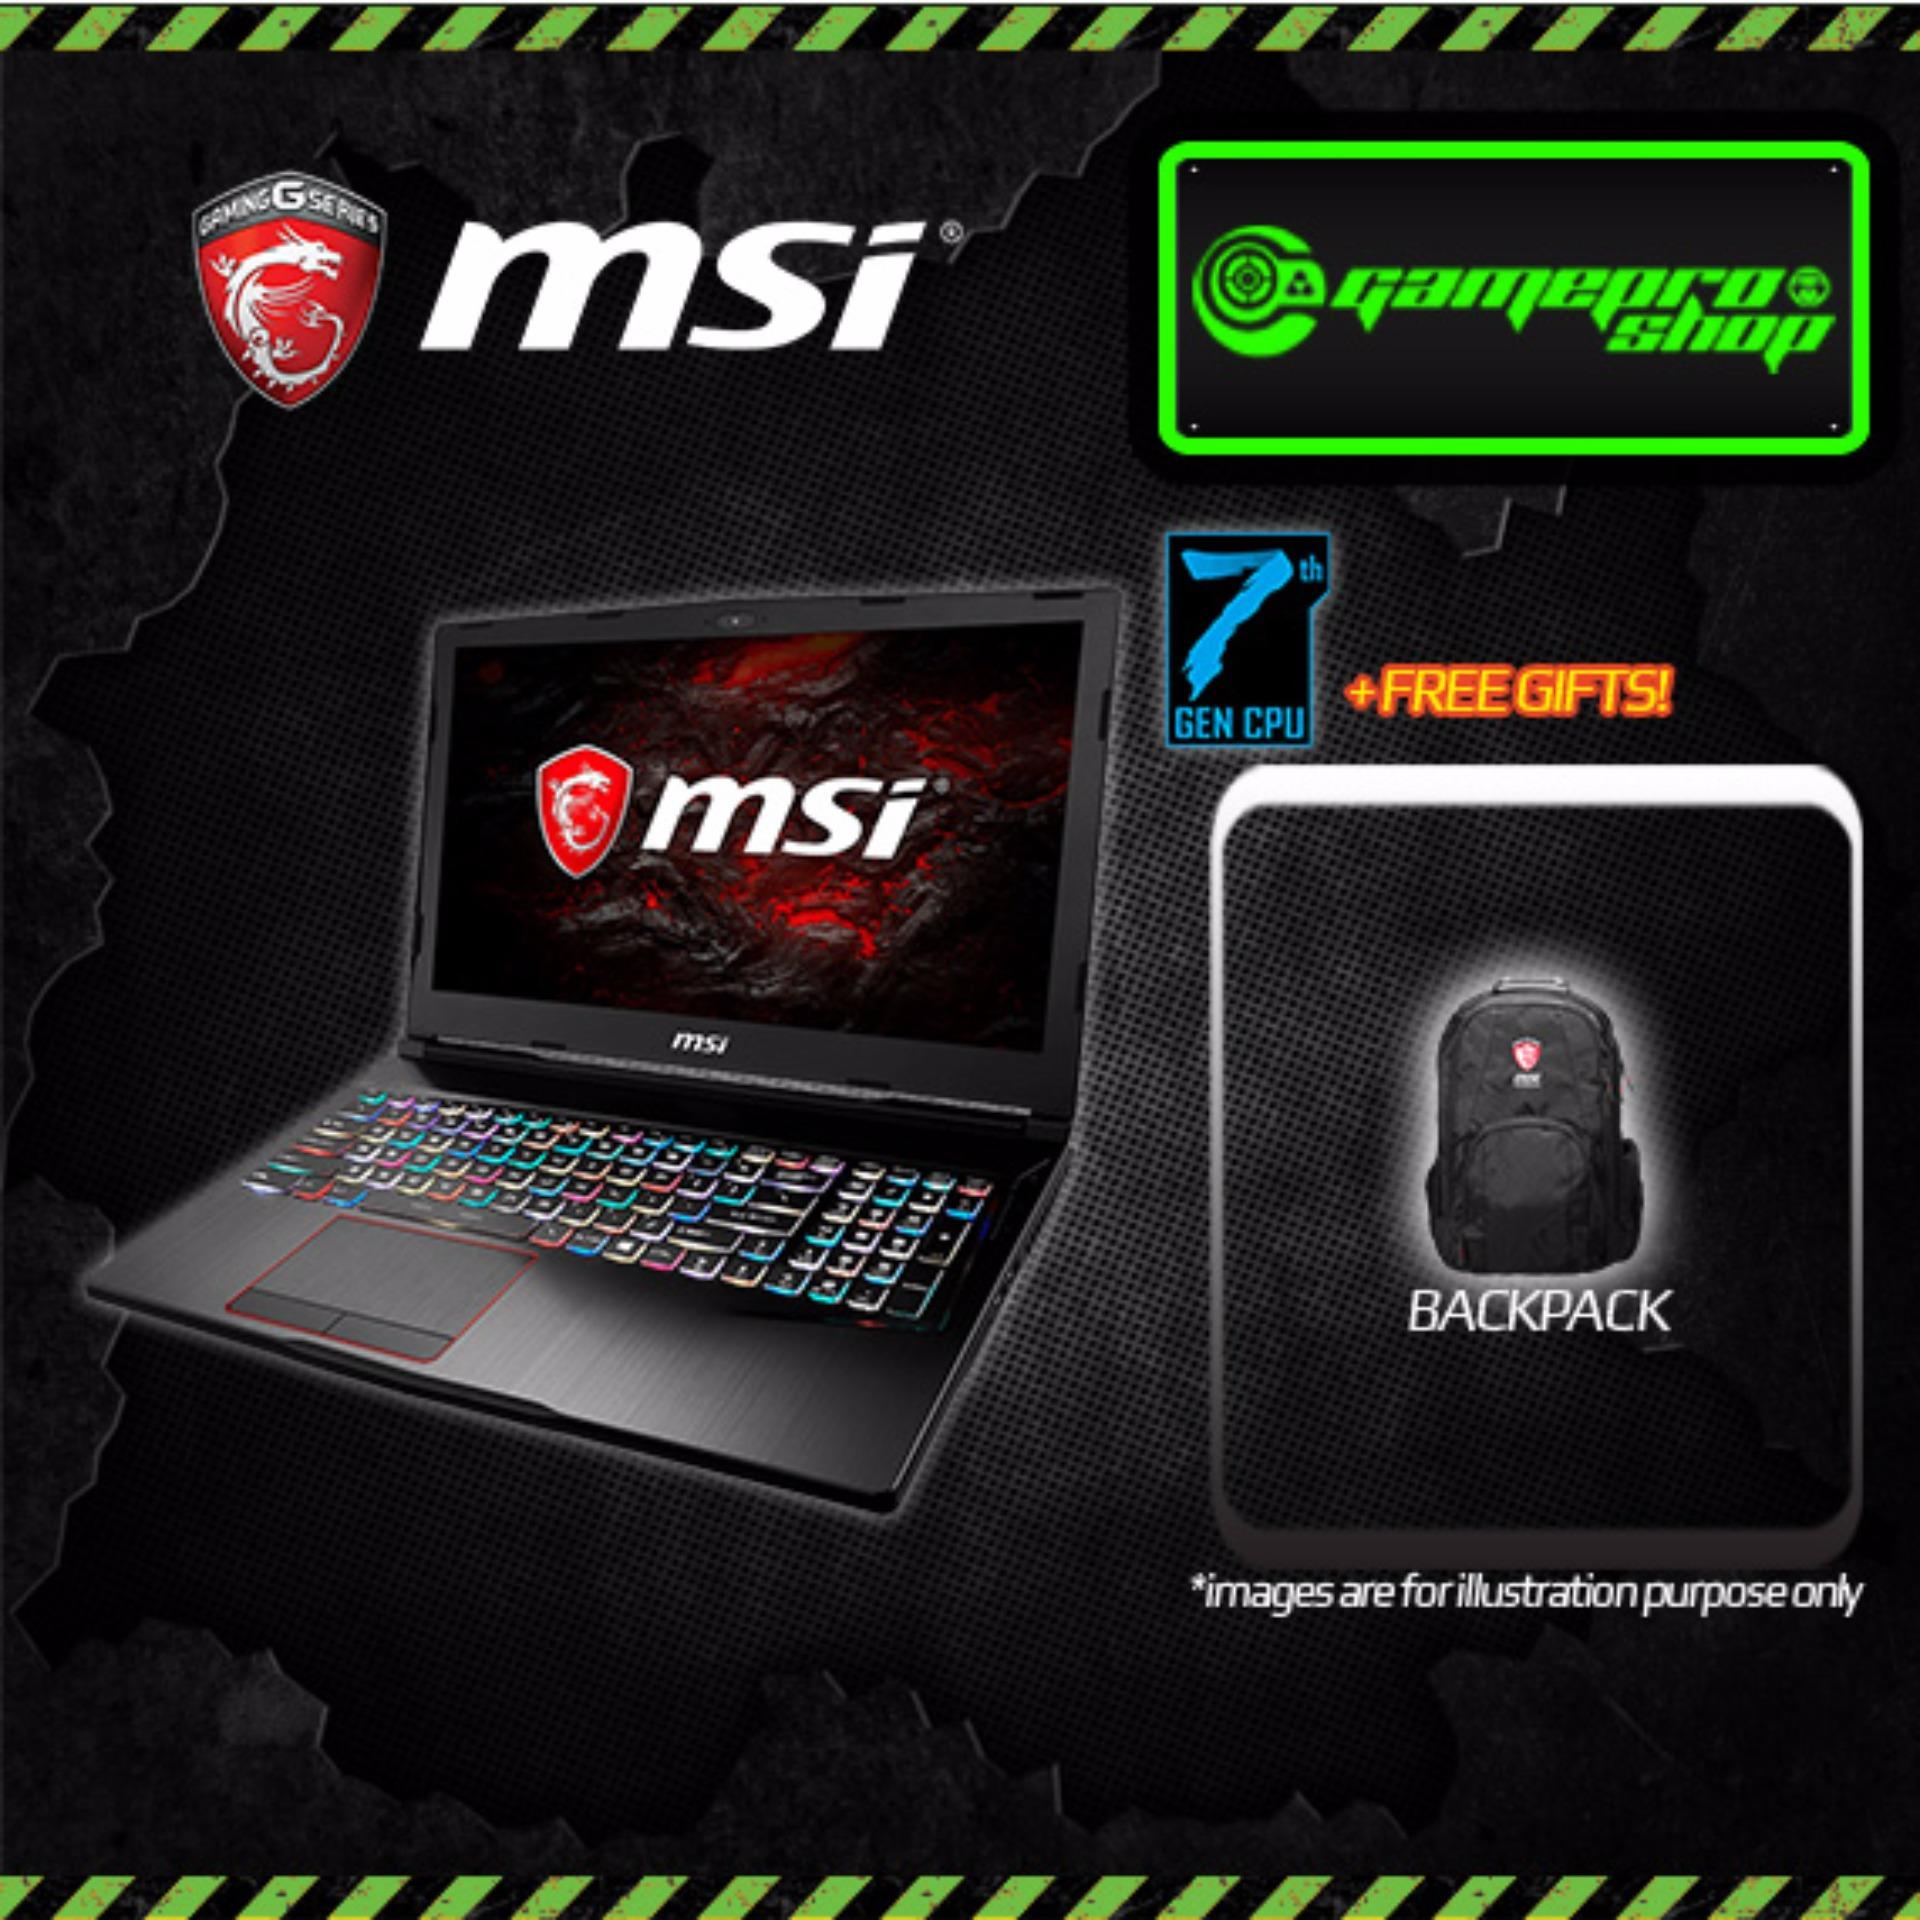 Msi Ge63vr 7rd Raider I7 7700hq 8gb Gtx1050ti 4gb 156 Gaming Ge63 Rgb 8750h 16gb 256gb 1tb Gtx1070 W10 Fhd Laptop